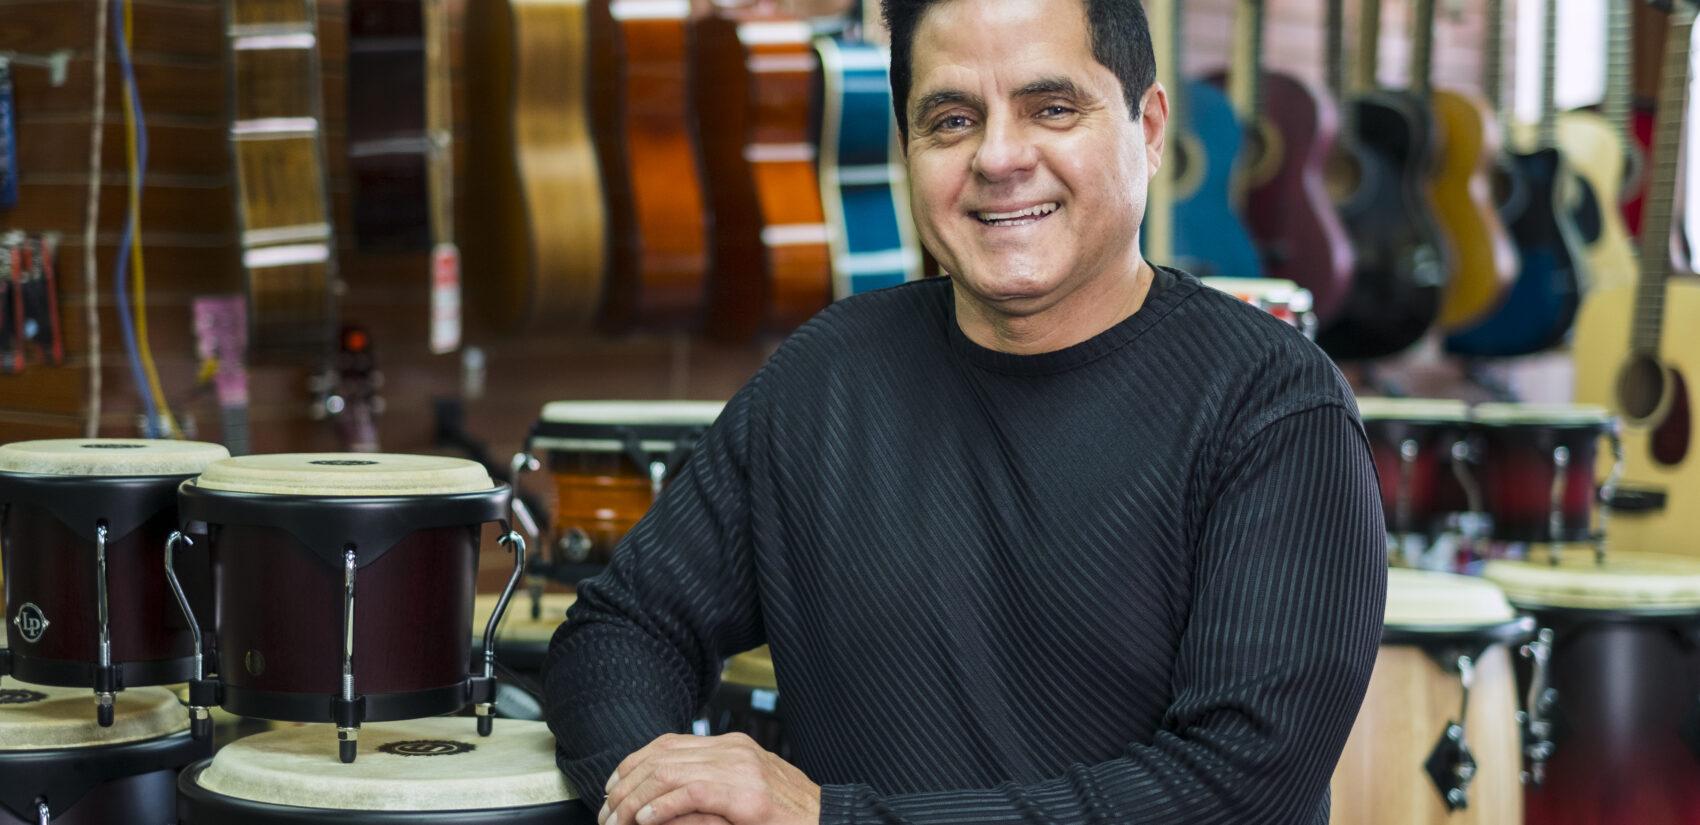 Reinaldo Meléndez took over Centro Musical in 2014 after the former owner, Wilfredo Gonzalez, retired. | Reinaldo Meléndez se hizo cargo de Centro Musical en 2014 después de que el ex propietario, Wilfredo González, se retirara. (Photo by Bernardo Morillo for WHYY)